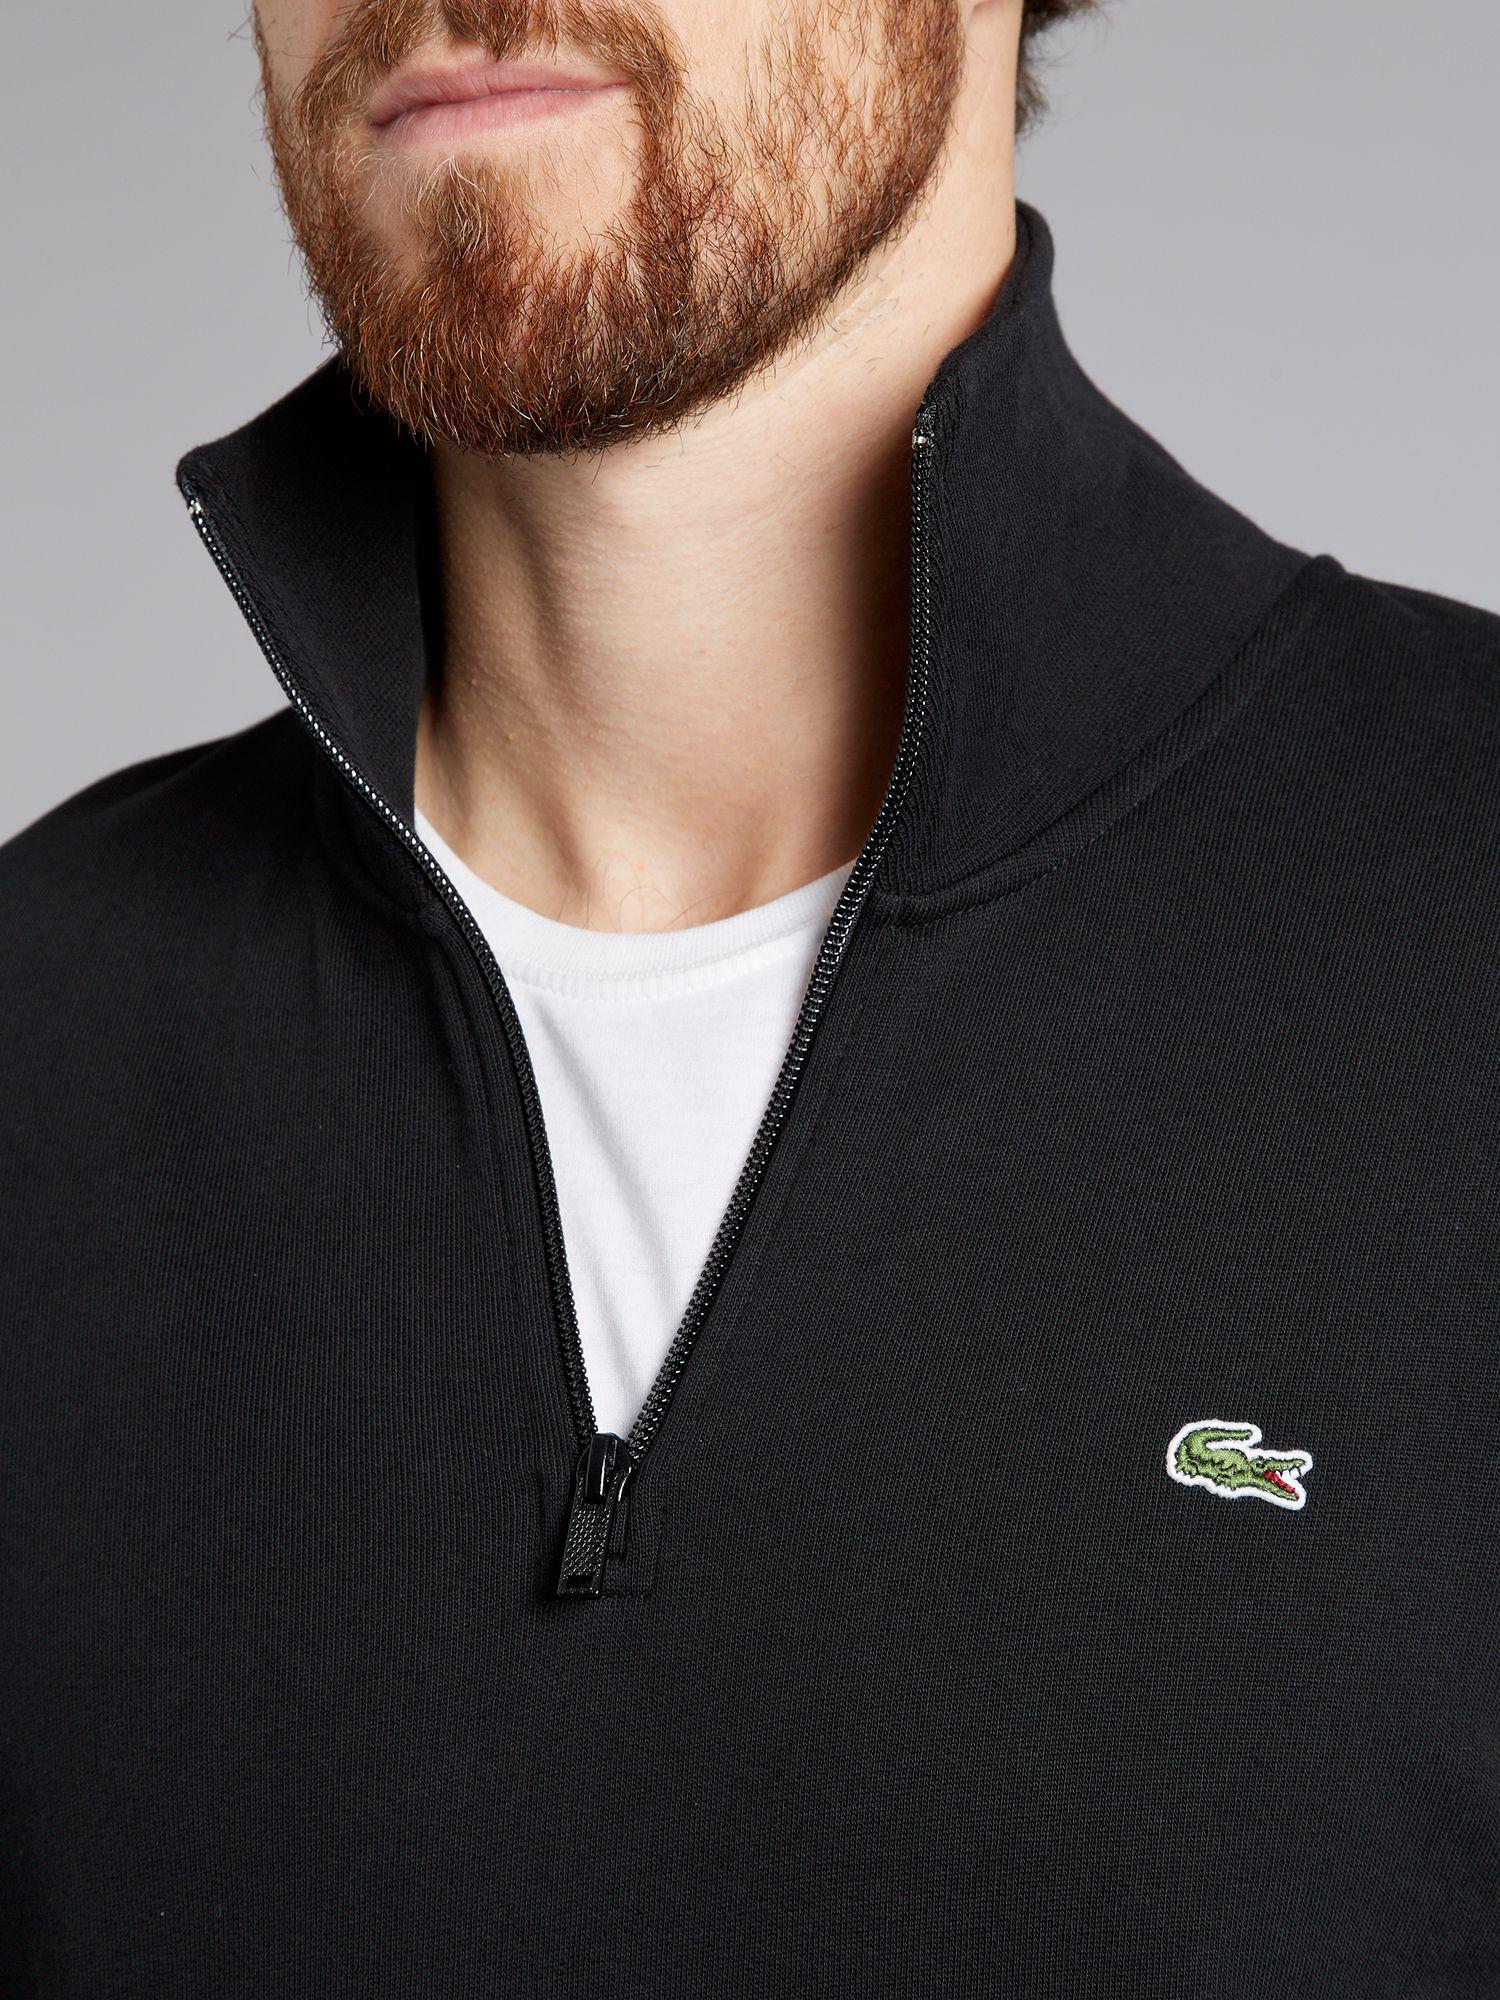 Lacoste Cotton Cashmere Quarter Zip Sweater English